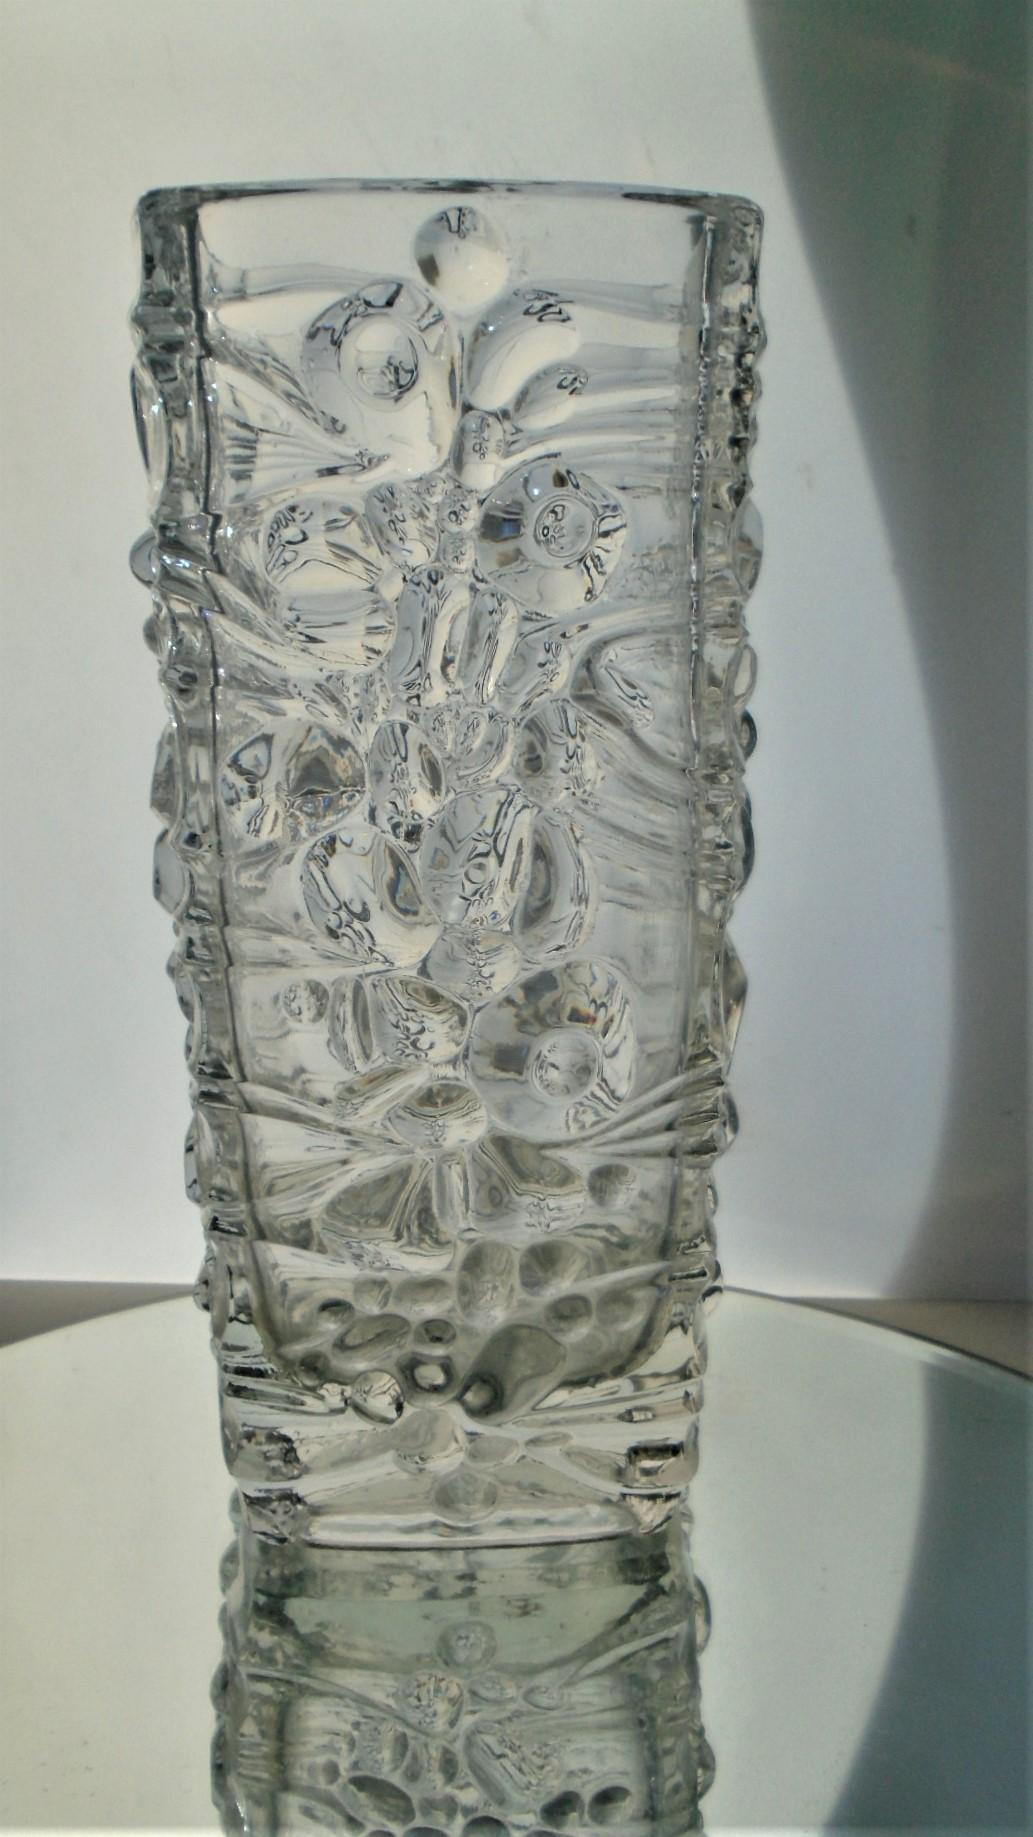 1974 vintage Sklo Union Hermanova Hut  pressed glass vase designed by Frantisek Peceny.